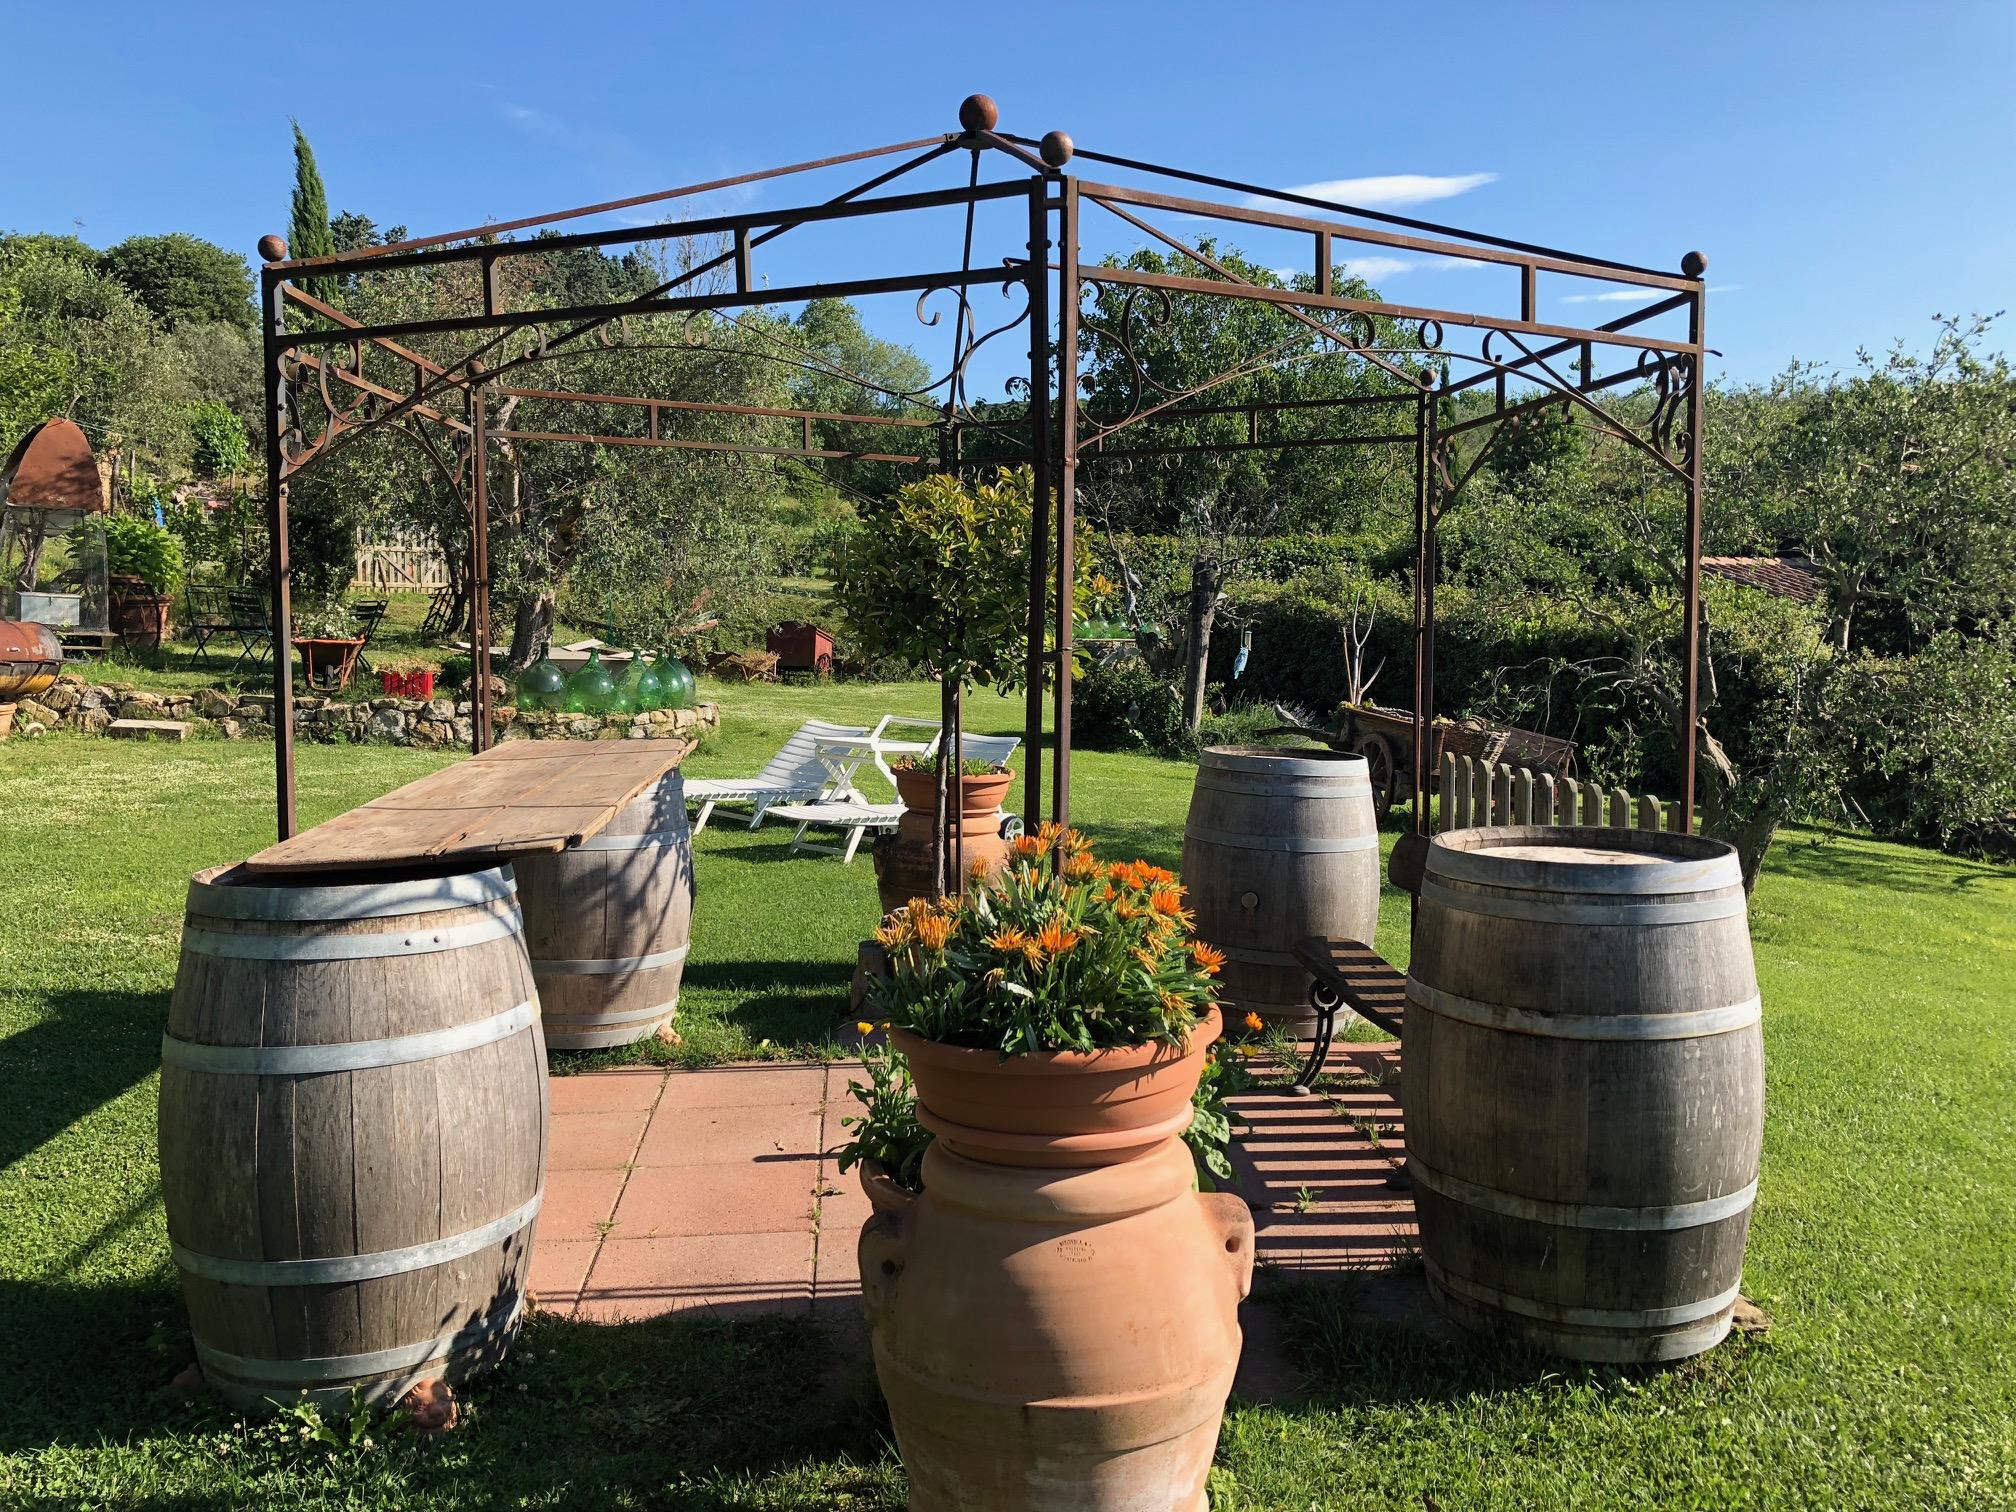 Lorenzo's Garden